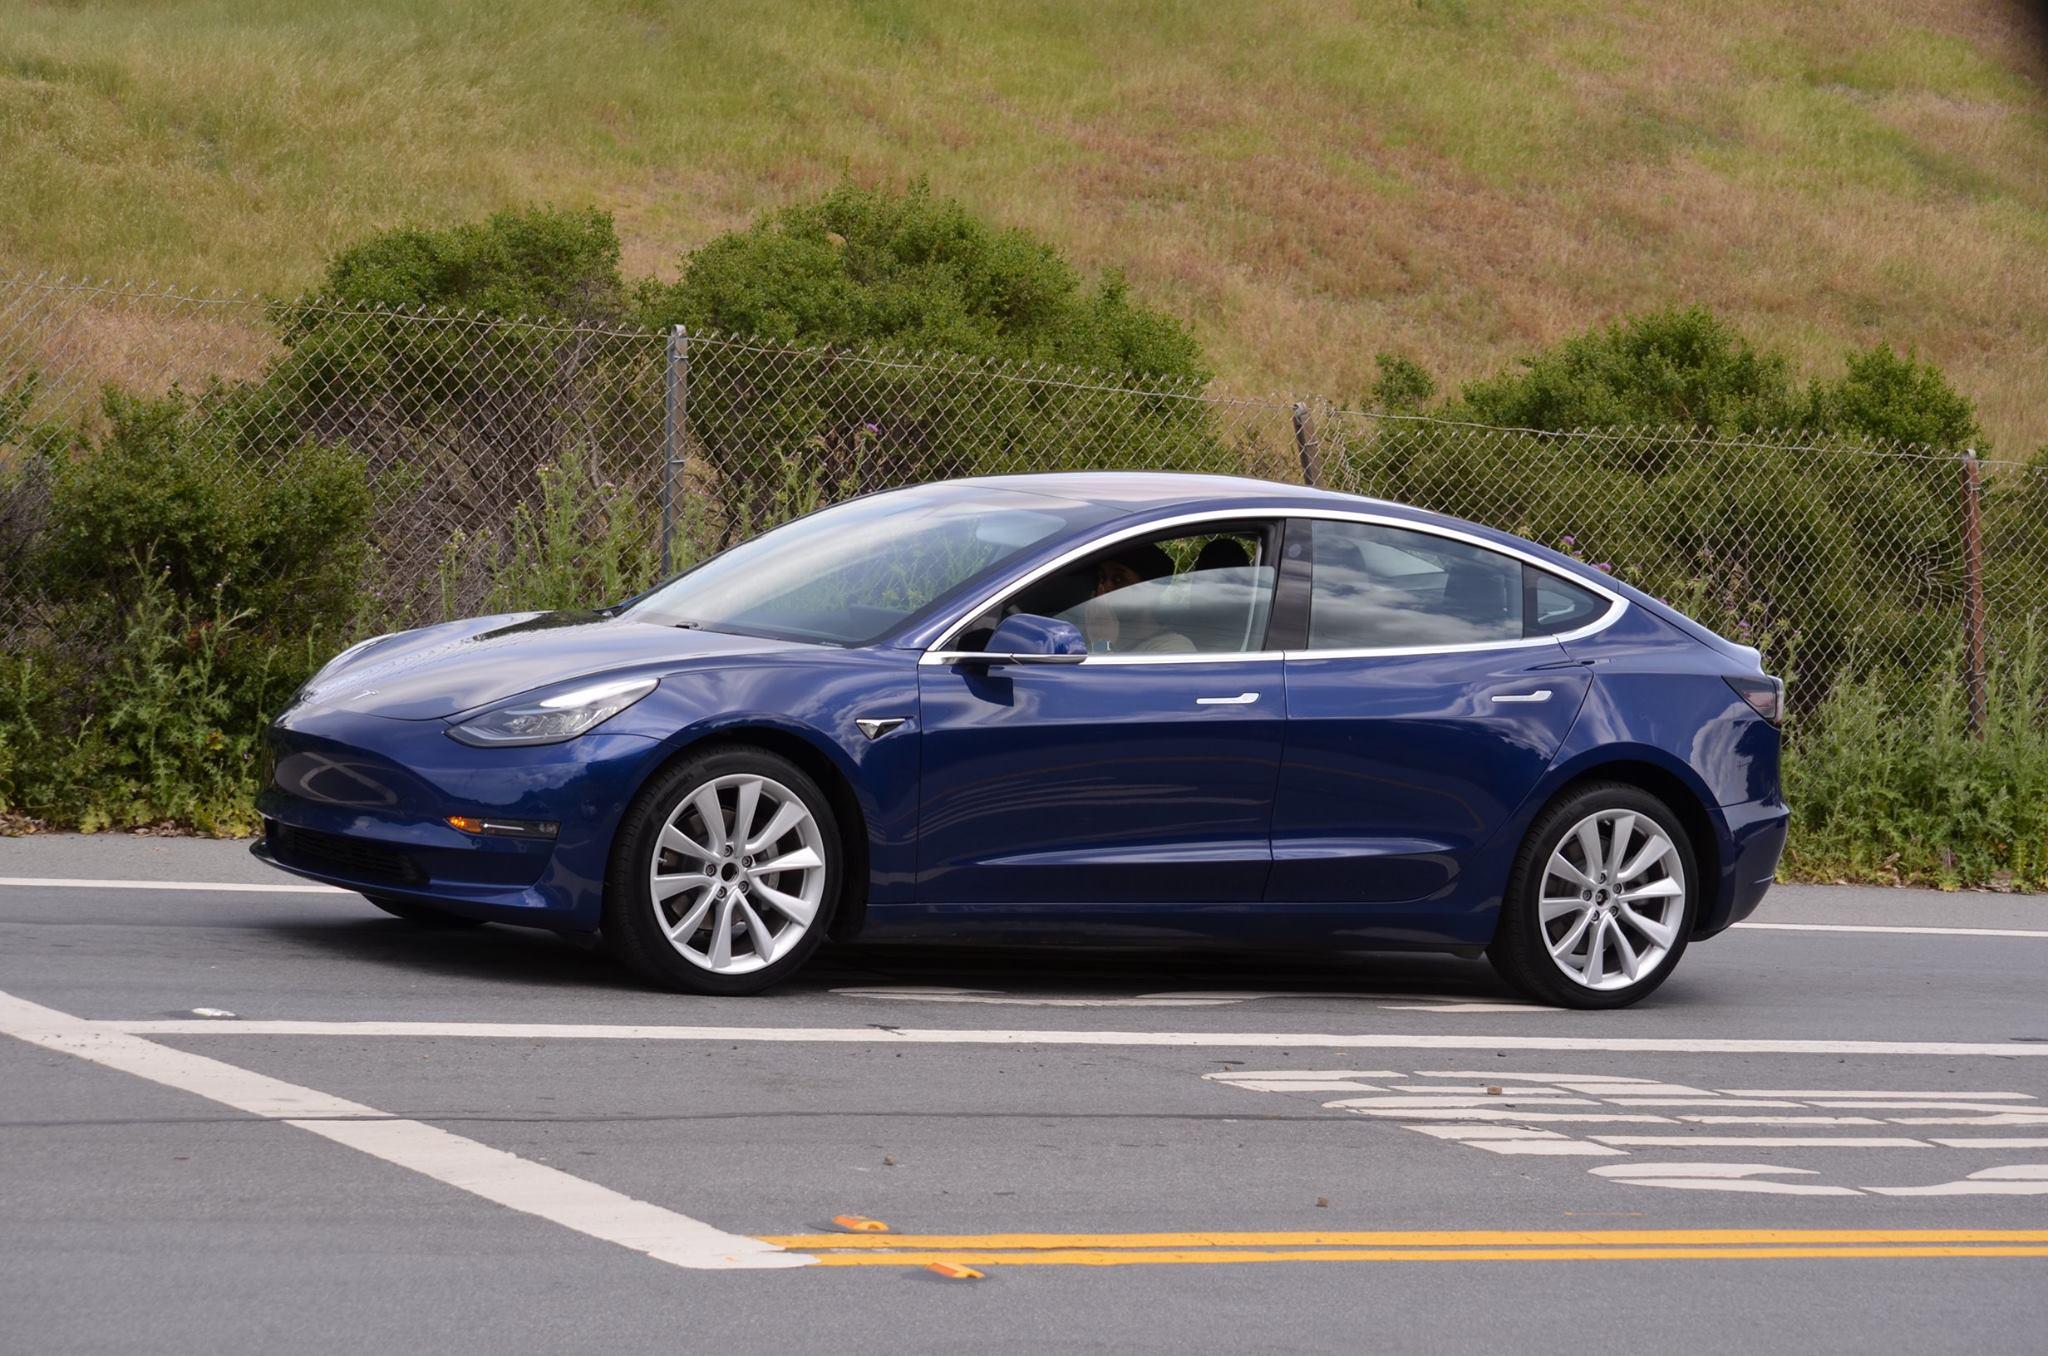 Refined Blue Tesla Model 3 Spotted Once Again Near Tesla Hq